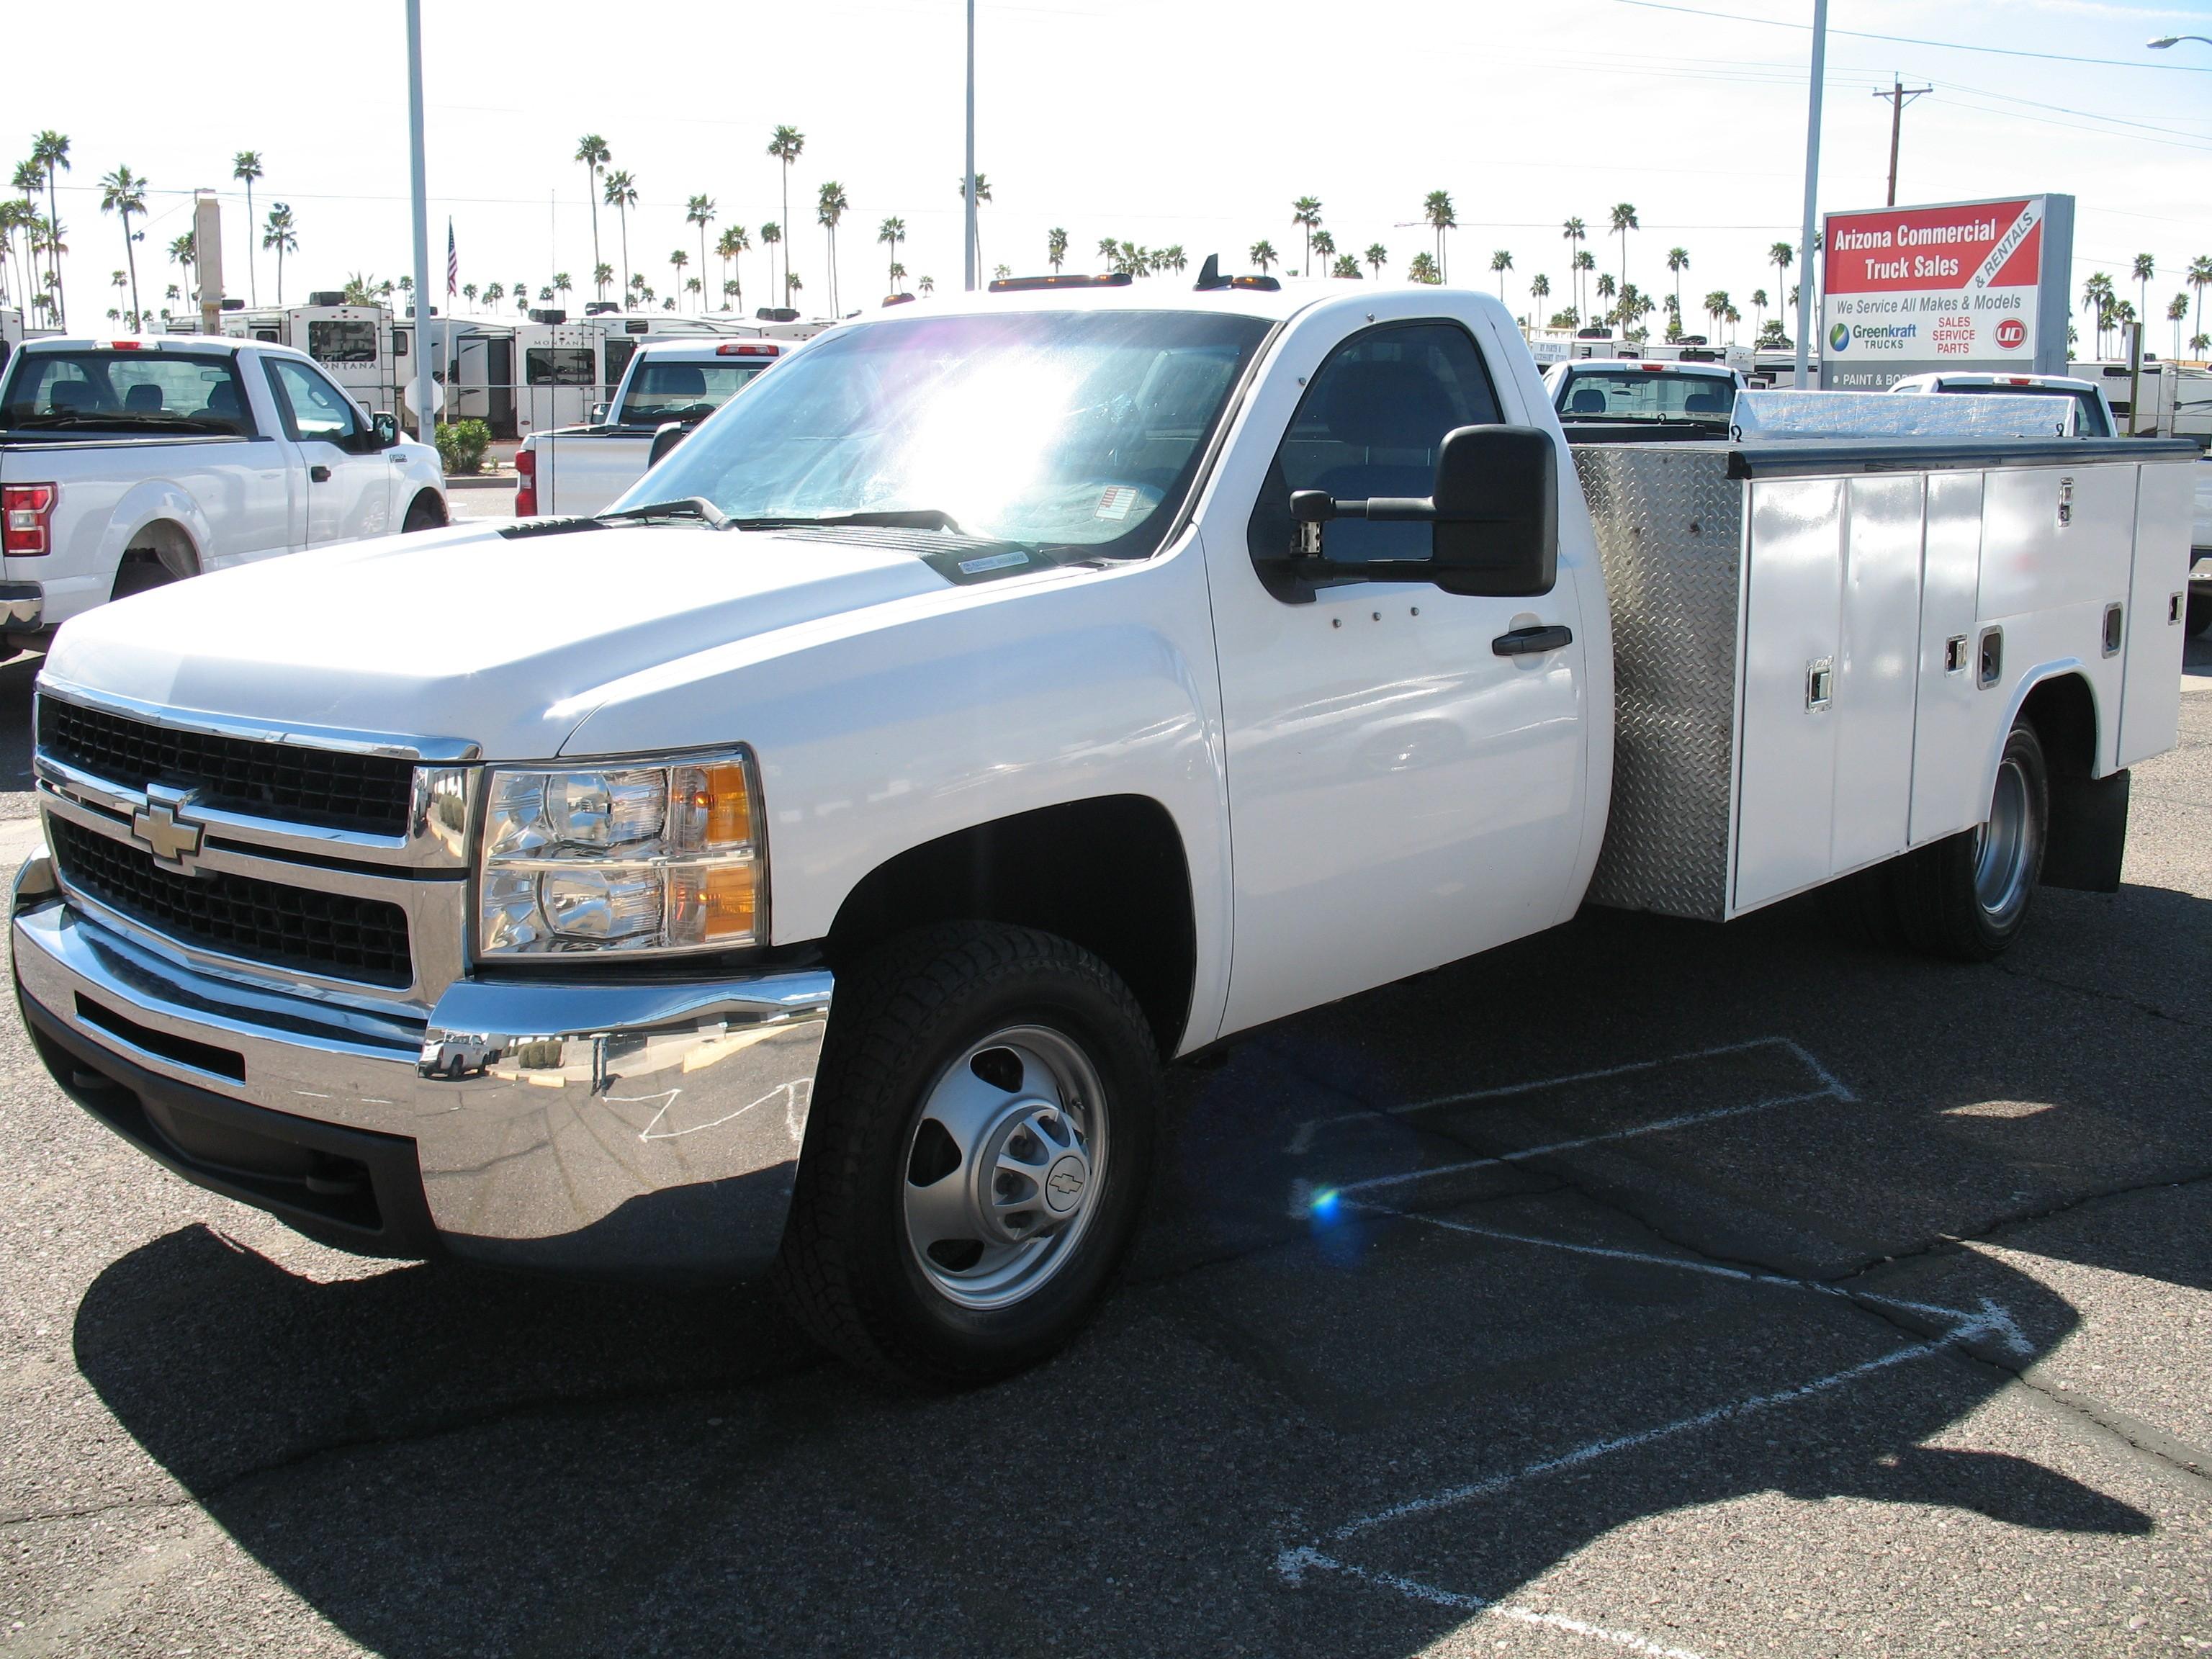 Used, 2008, Chevrolet, Silverado 3500, Service / Utility Trucks